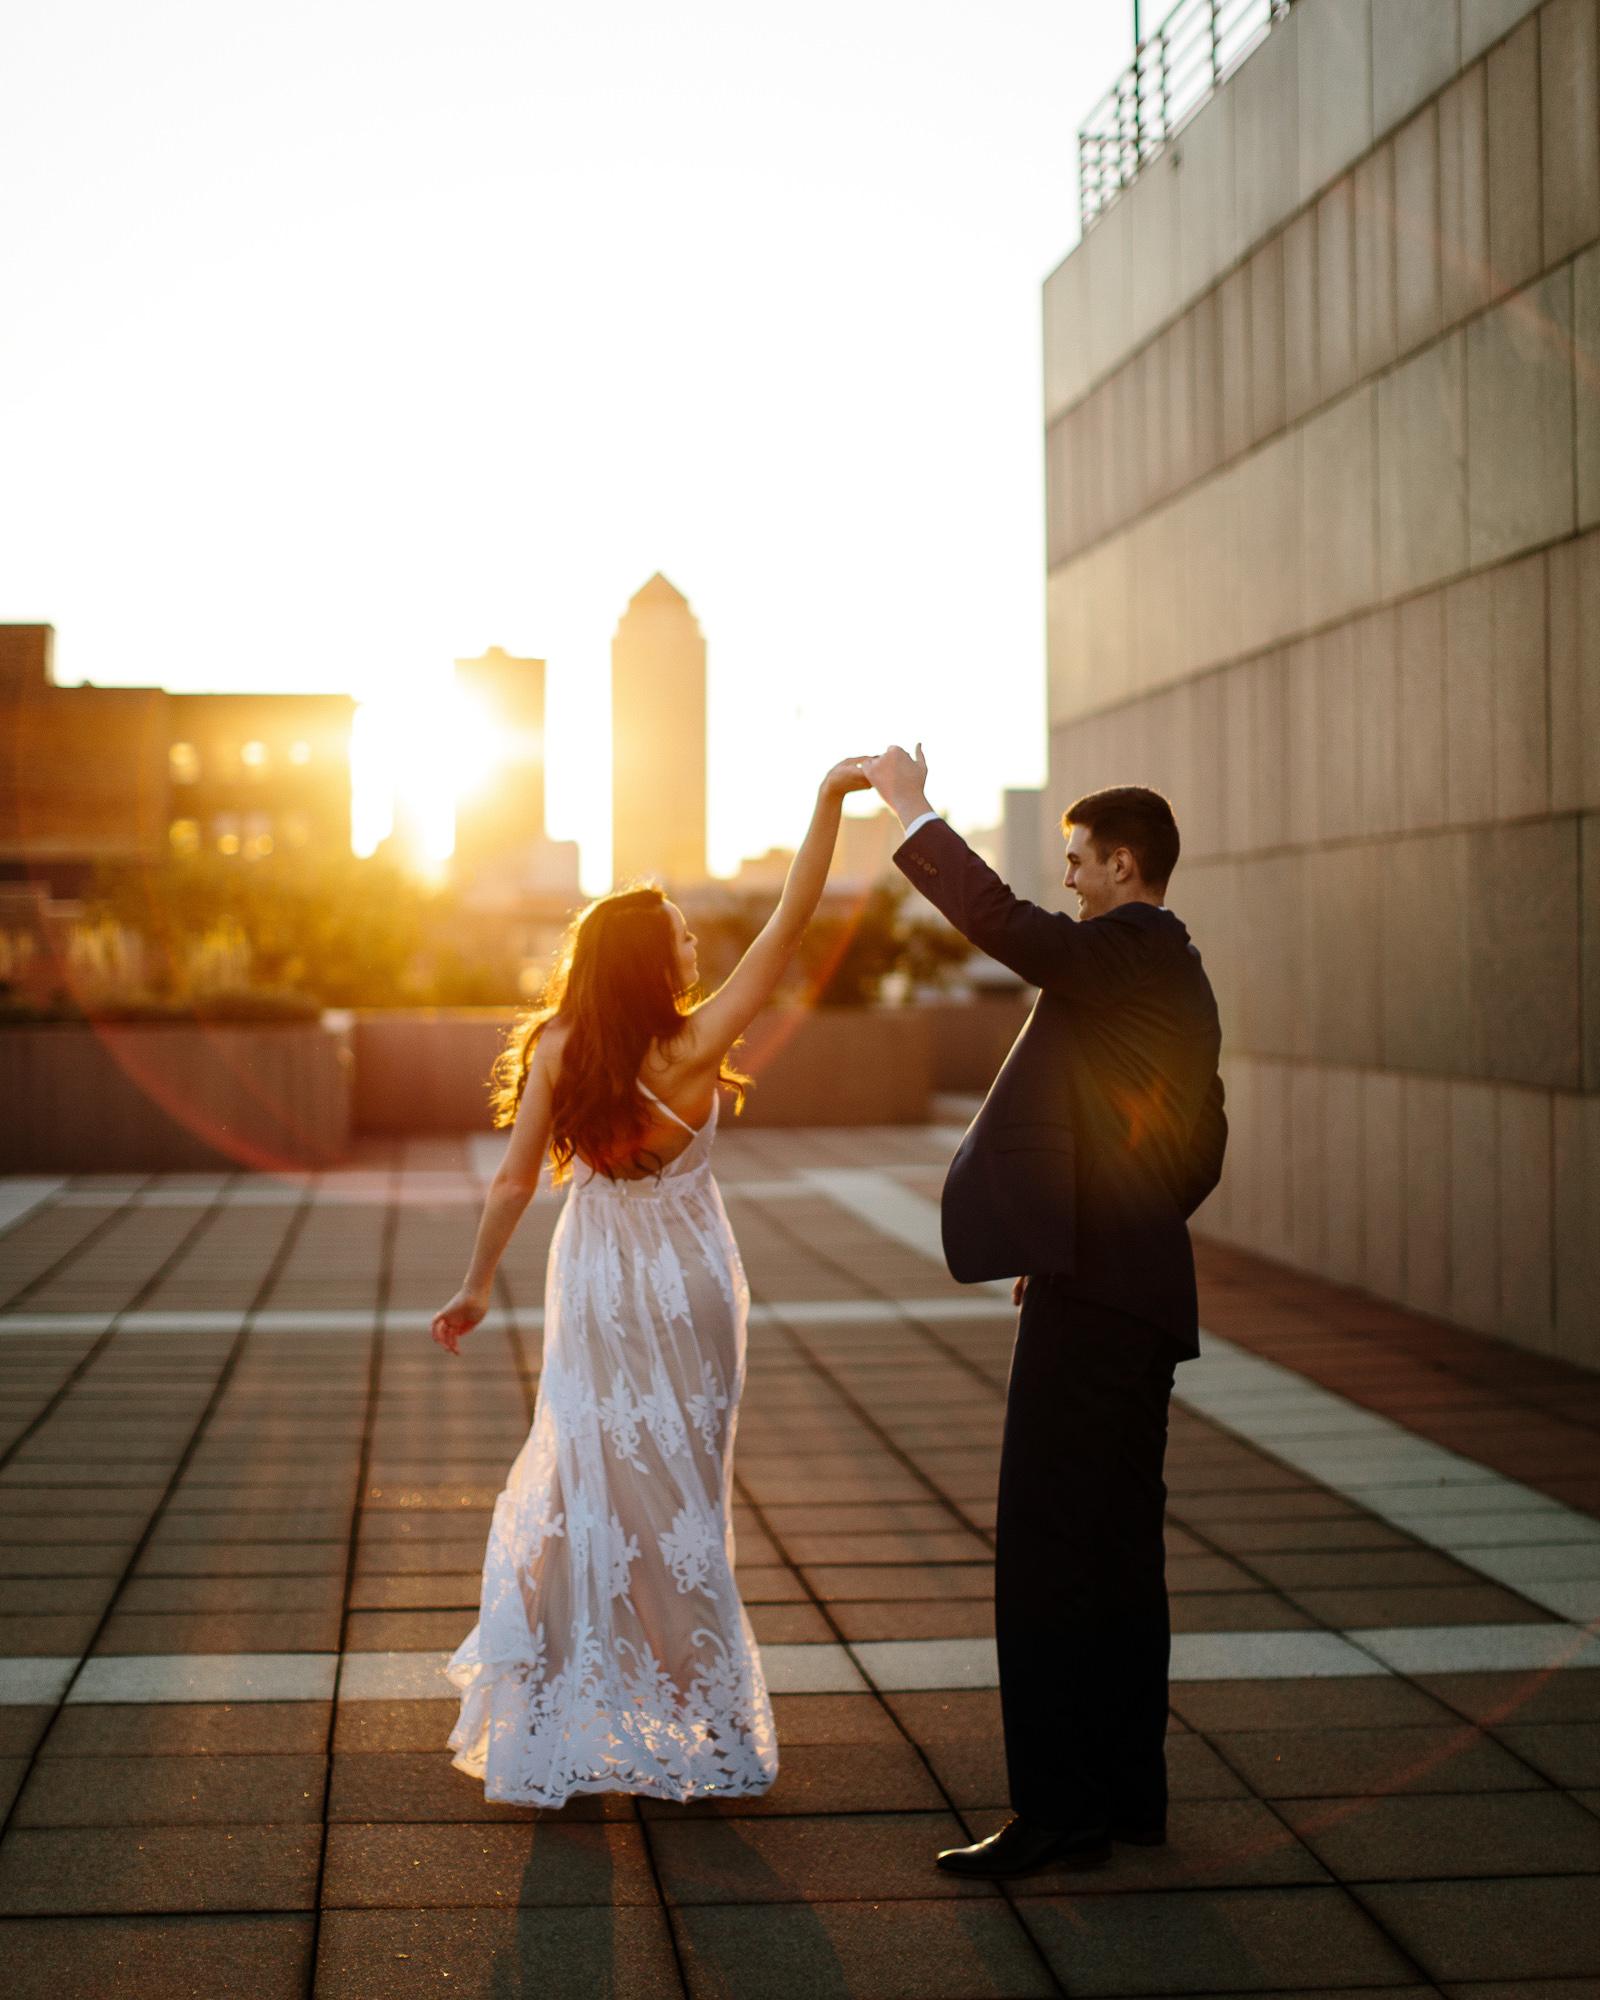 wedding-elopement-adventerous-romantic-timeless-des-moines-siouxfalls-photography-28.jpg